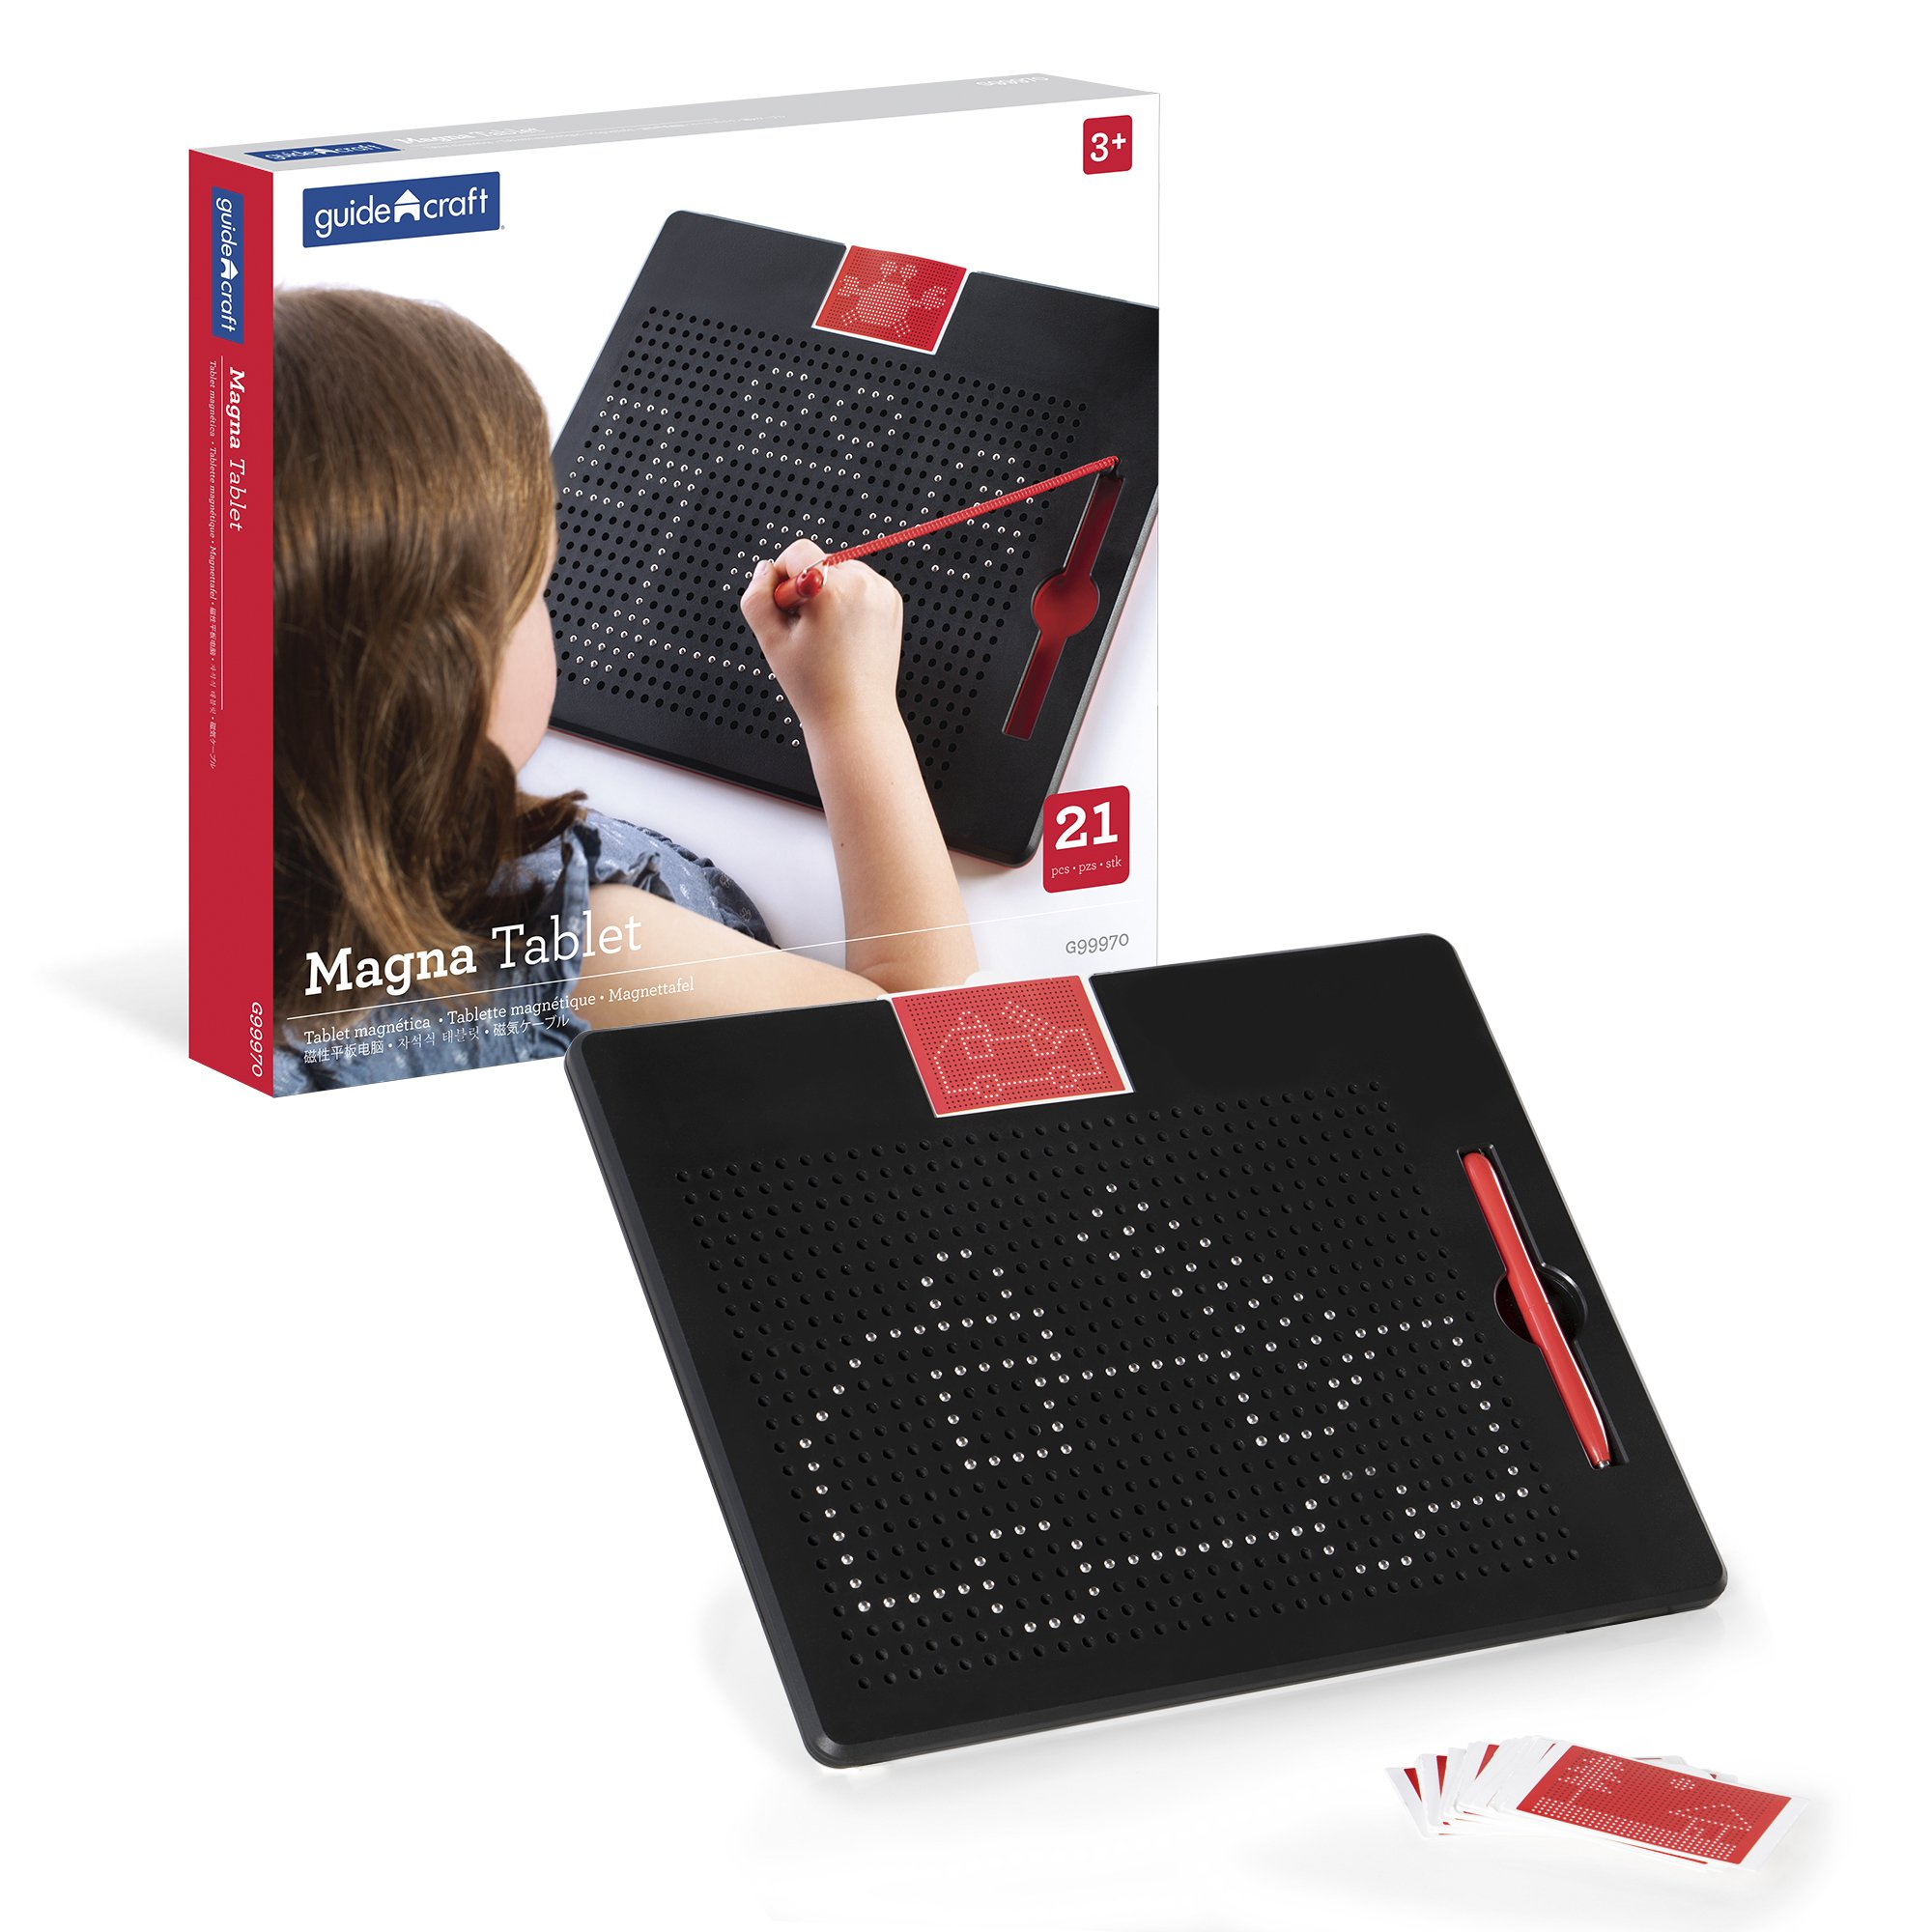 Guidecraft Magna Tablet - 2D Bead Drawing & Sketching, Magnetic Pen Tip Creative Design Preschool STEM Learning & Educational Toys Children